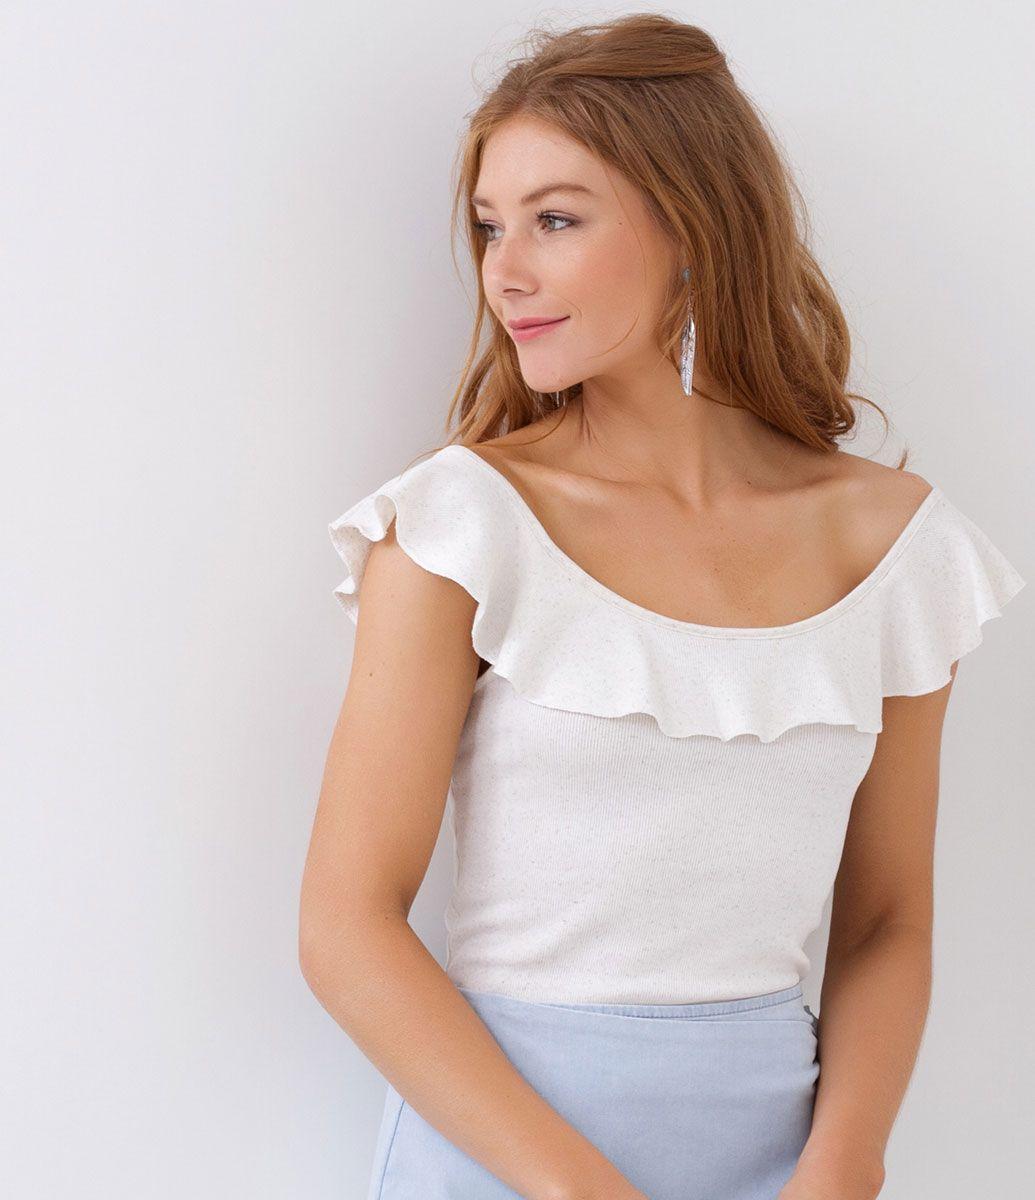 e24326f536 Blusa feminina Modelo ombro a ombro Com babado Manga curta Marca  Blue  Steel Tecido